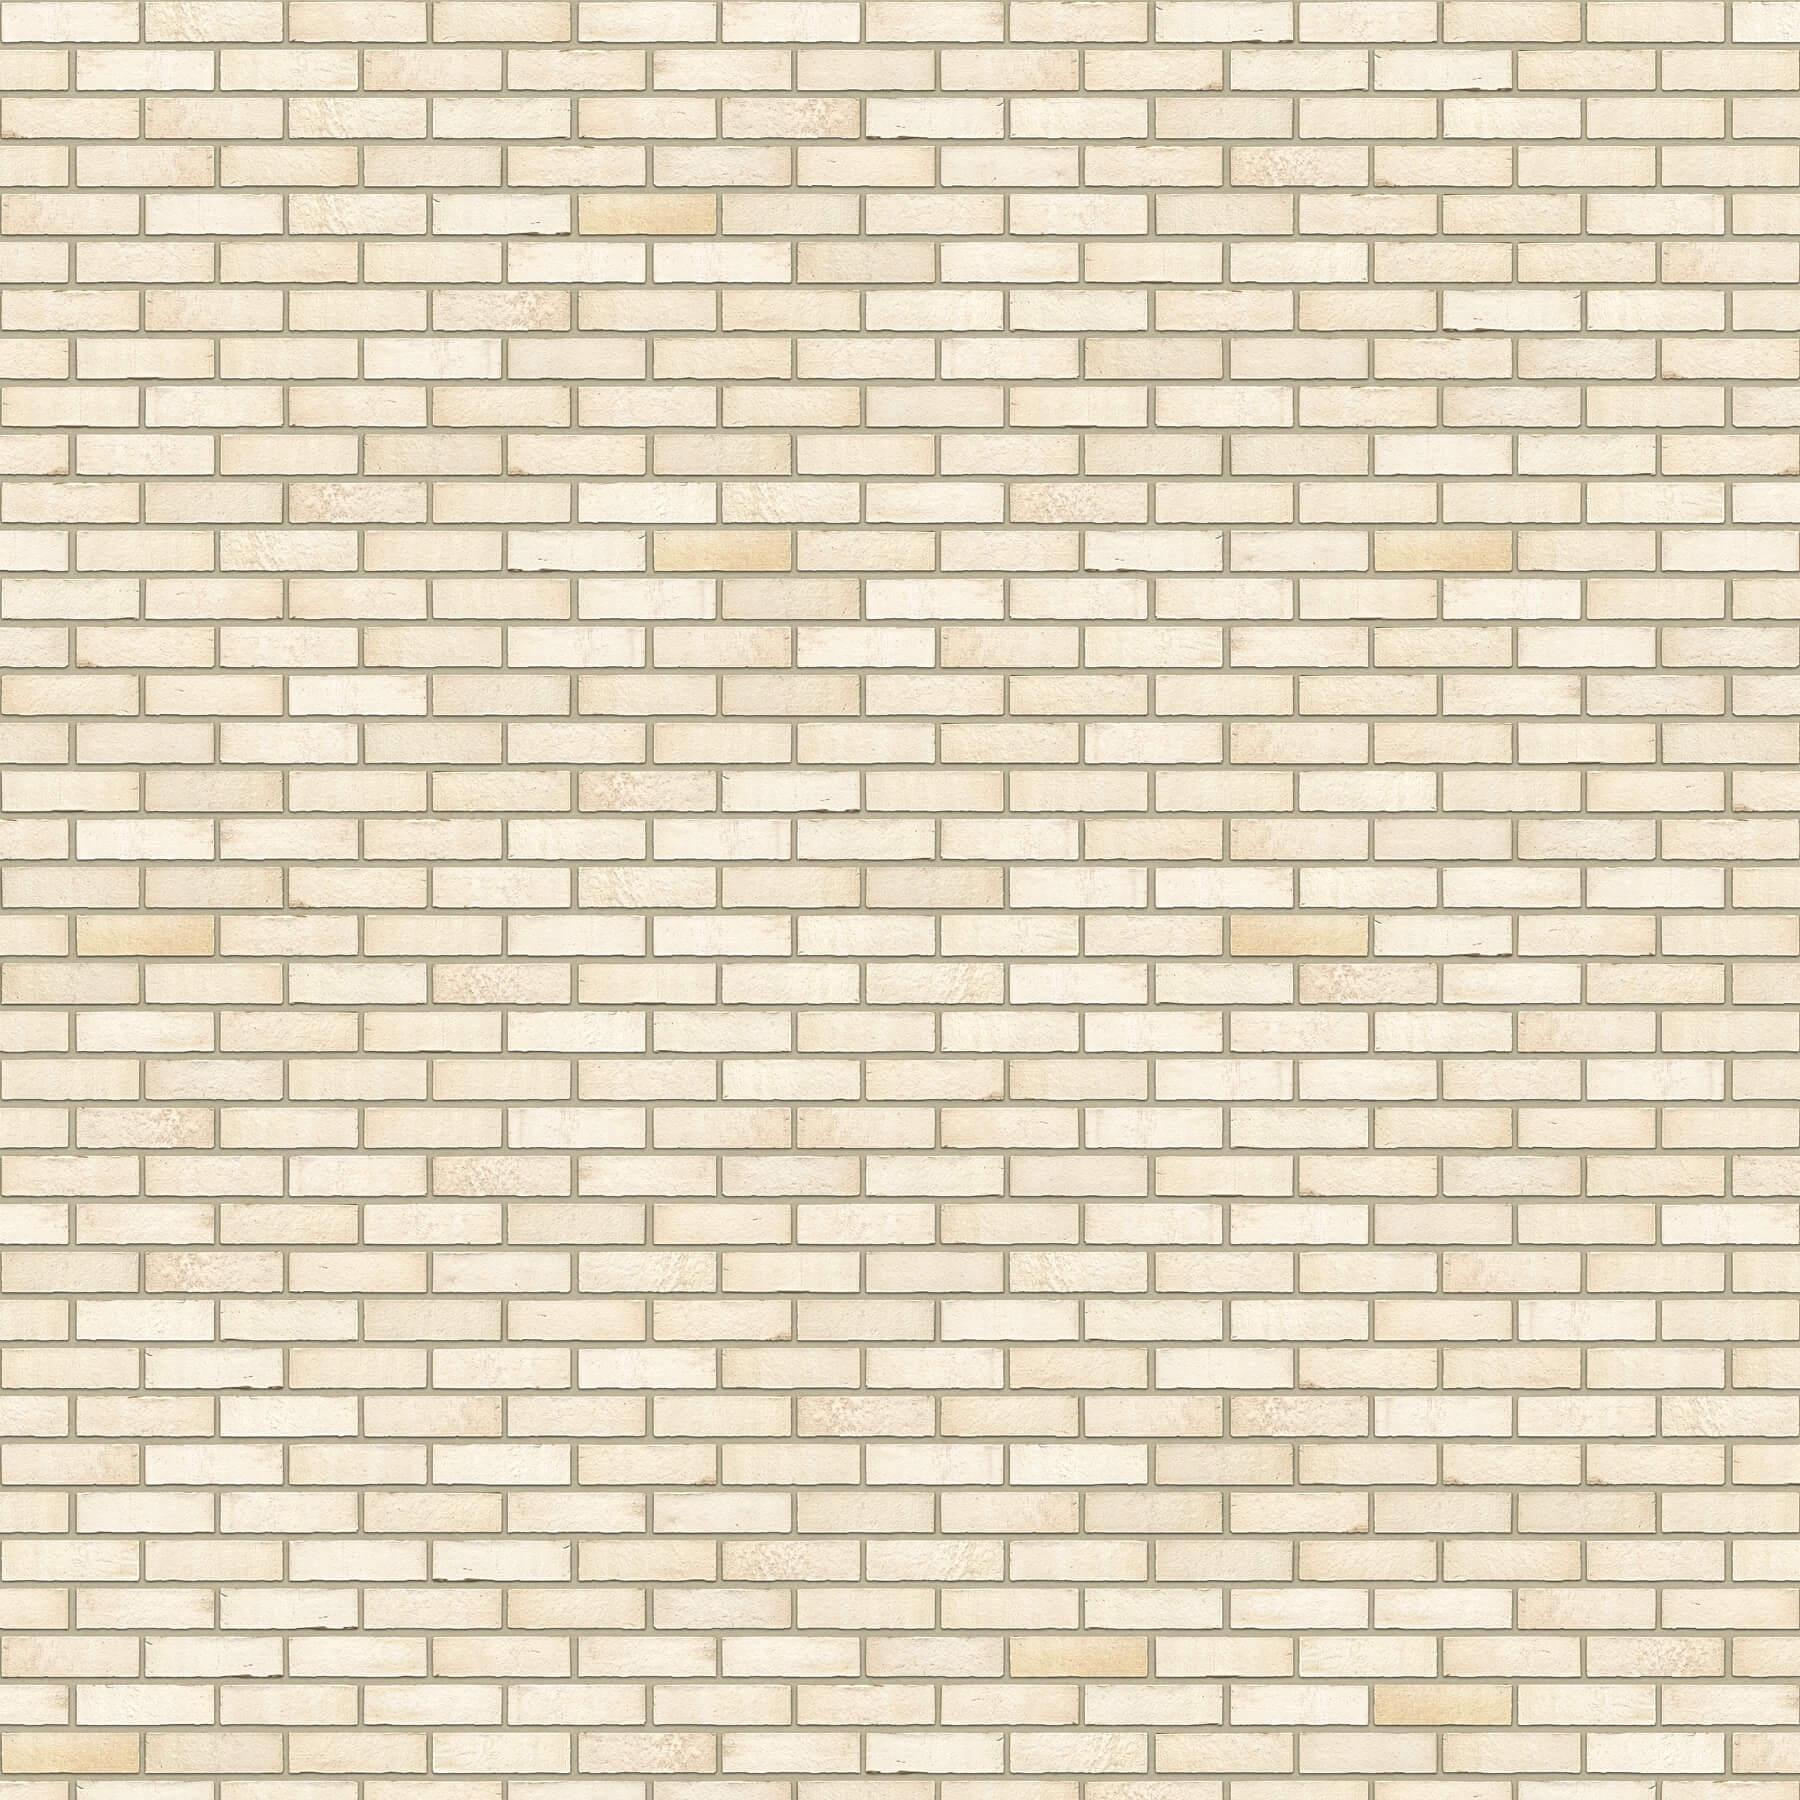 Puna-cigla-FeldHaus-Klinker-brick-house-beograd-nf-k-911-Bez Fuga